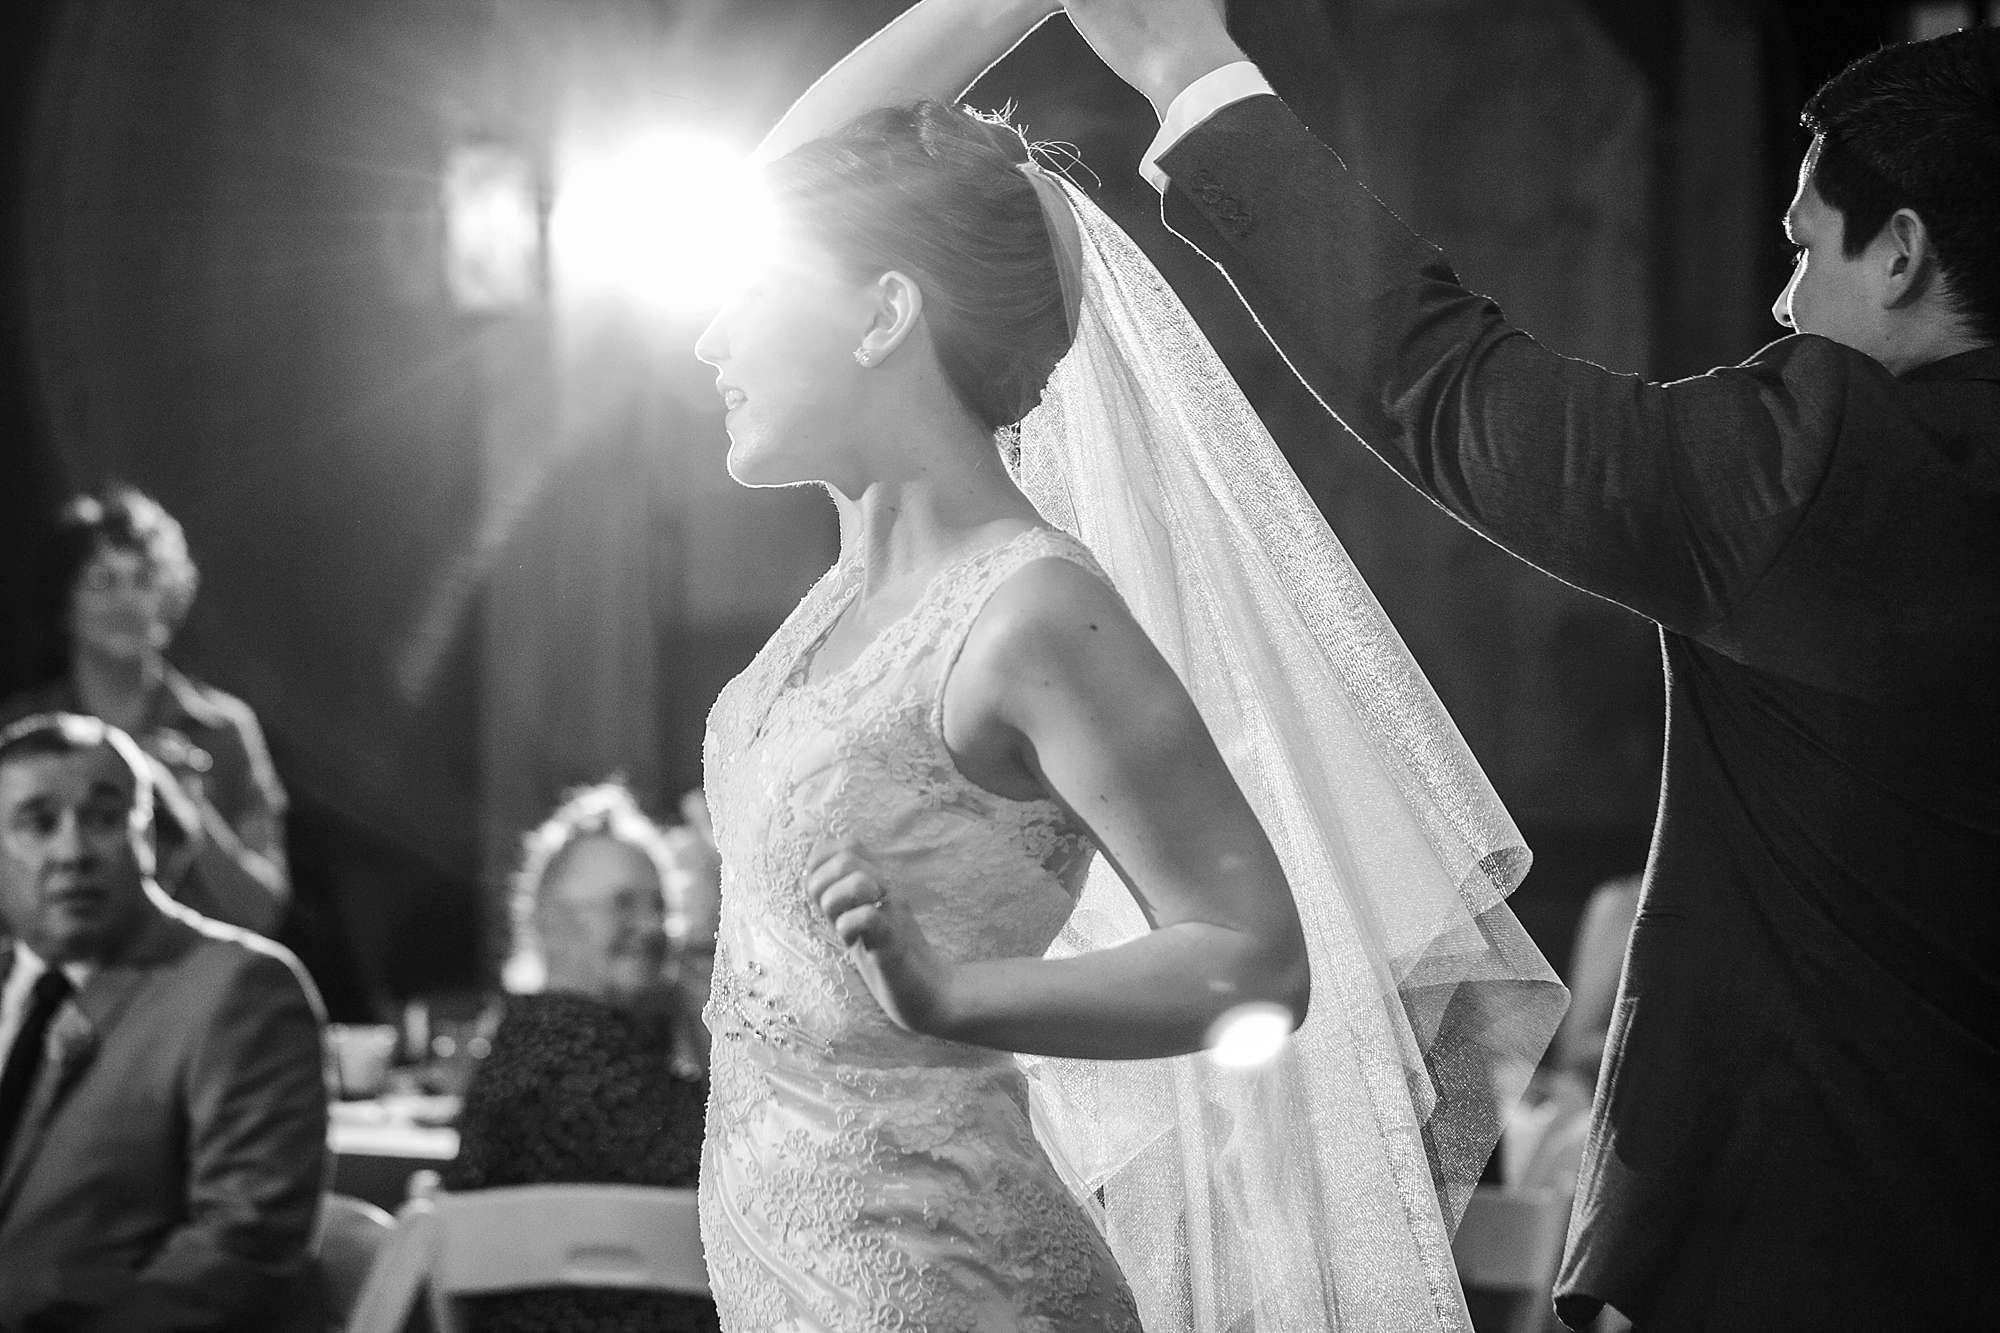 Bride and Groom's First Dance Wedding Reception Wedding Photography in Springfield, Branson and Kansas City Missouri, Fayetteville, Bentonville and Northwest Arkansas